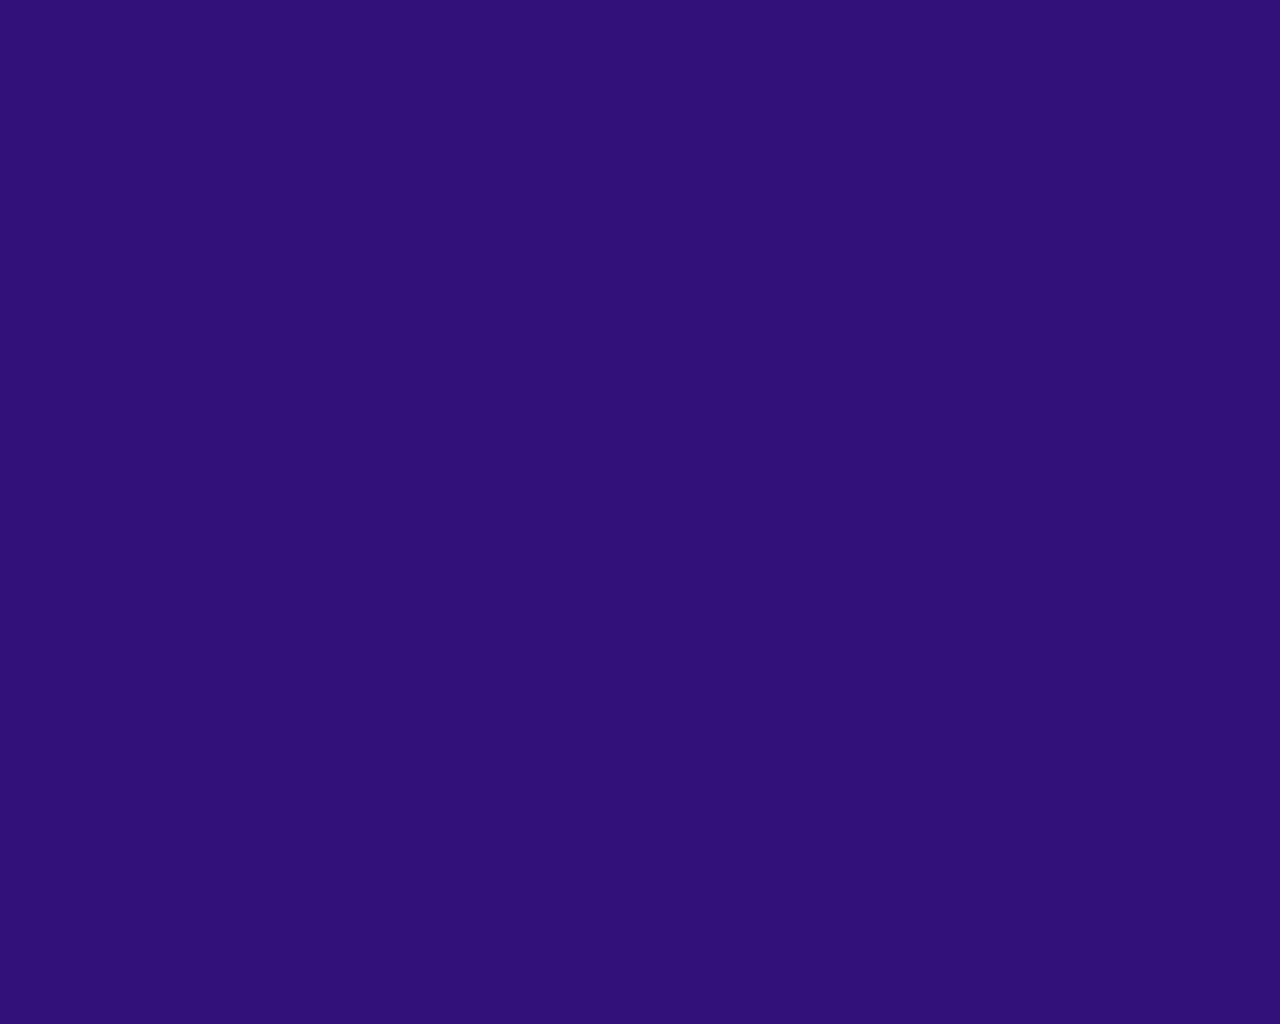 1280x1024 Persian Indigo Solid Color Background